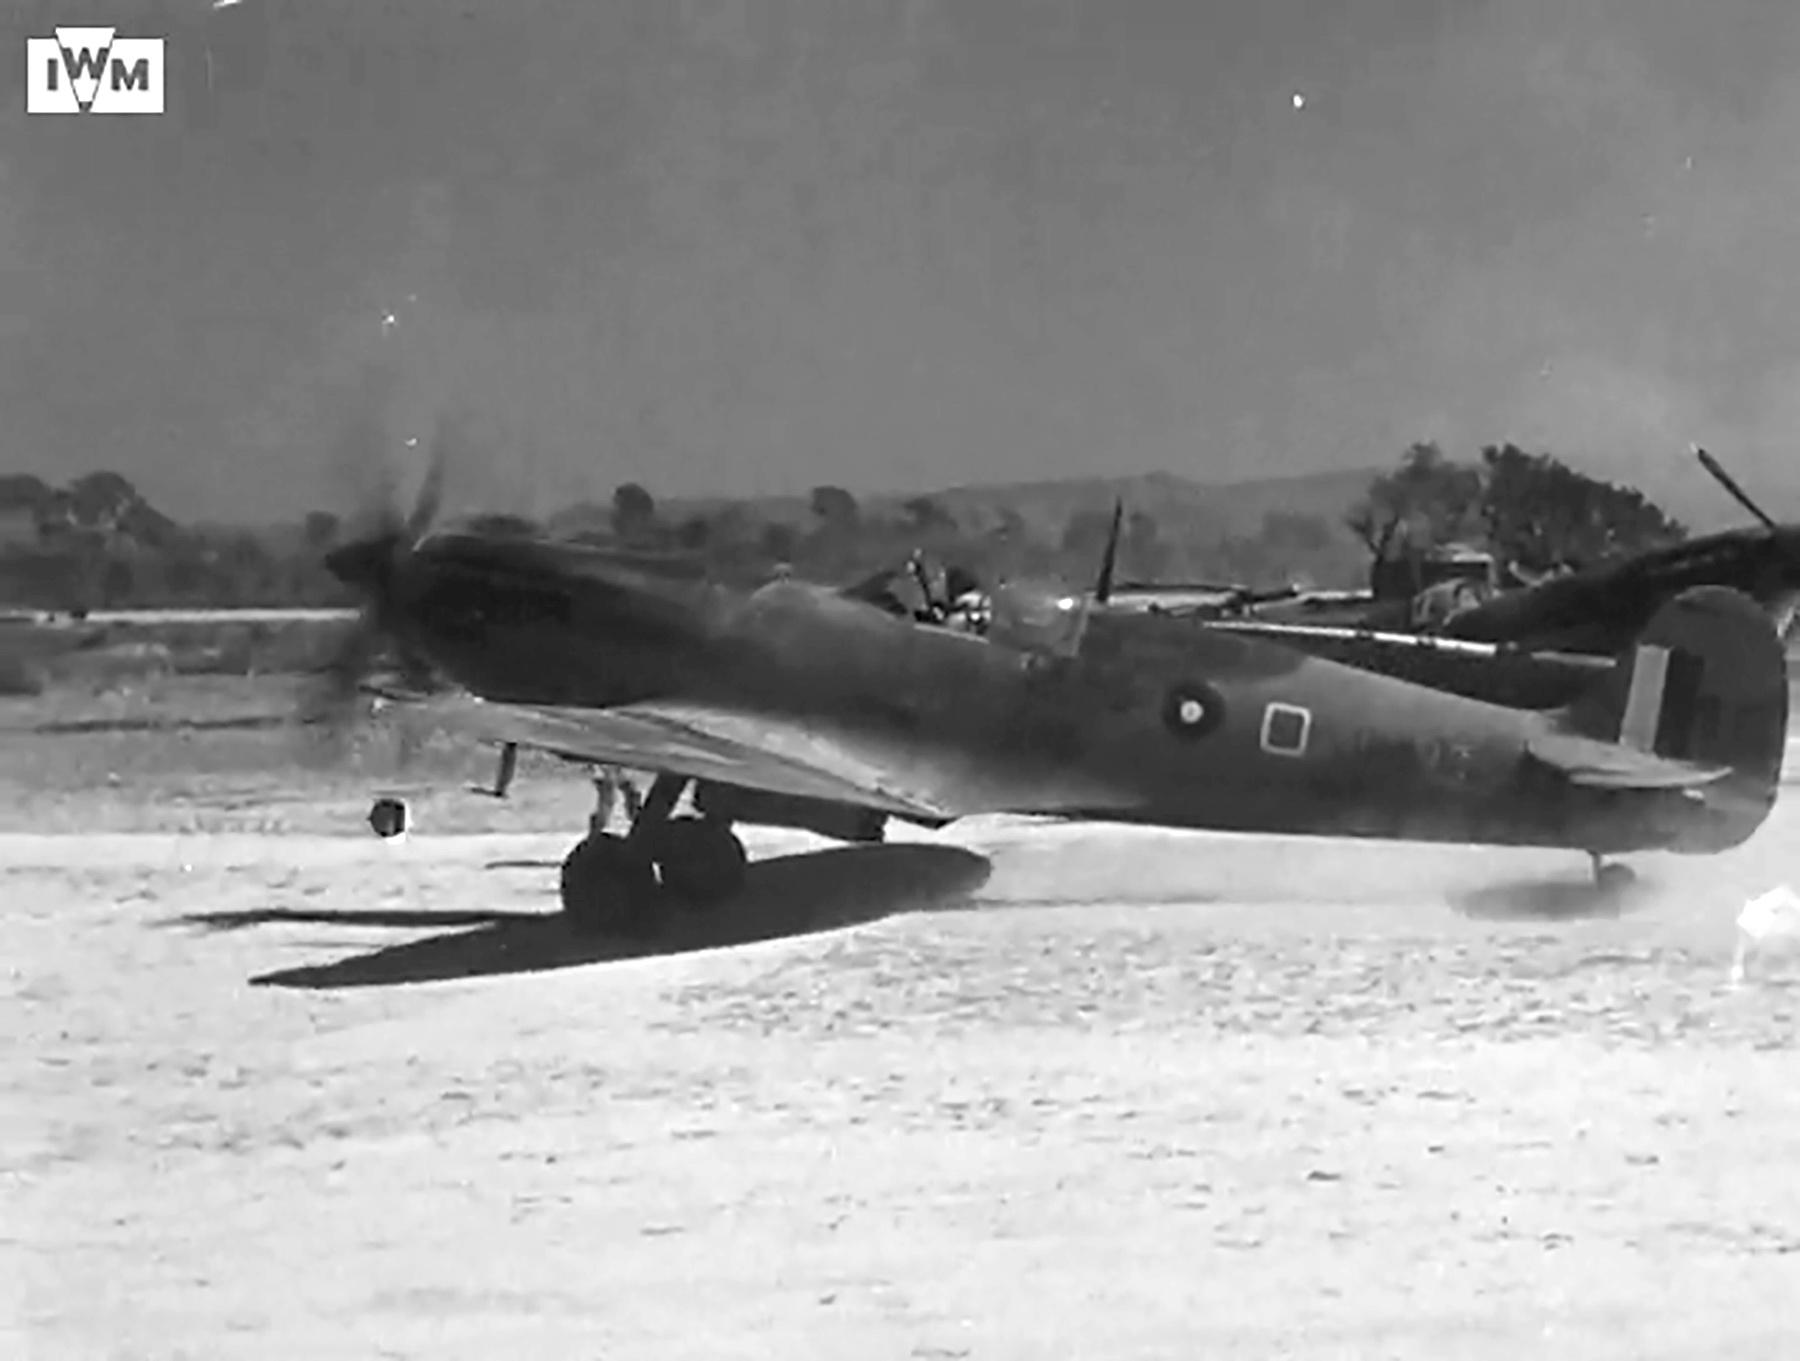 Spitfire VIII RAF 136Sqn HMO taking off from Rumkhapalong operating over Burma CBI 1944 IWM 01